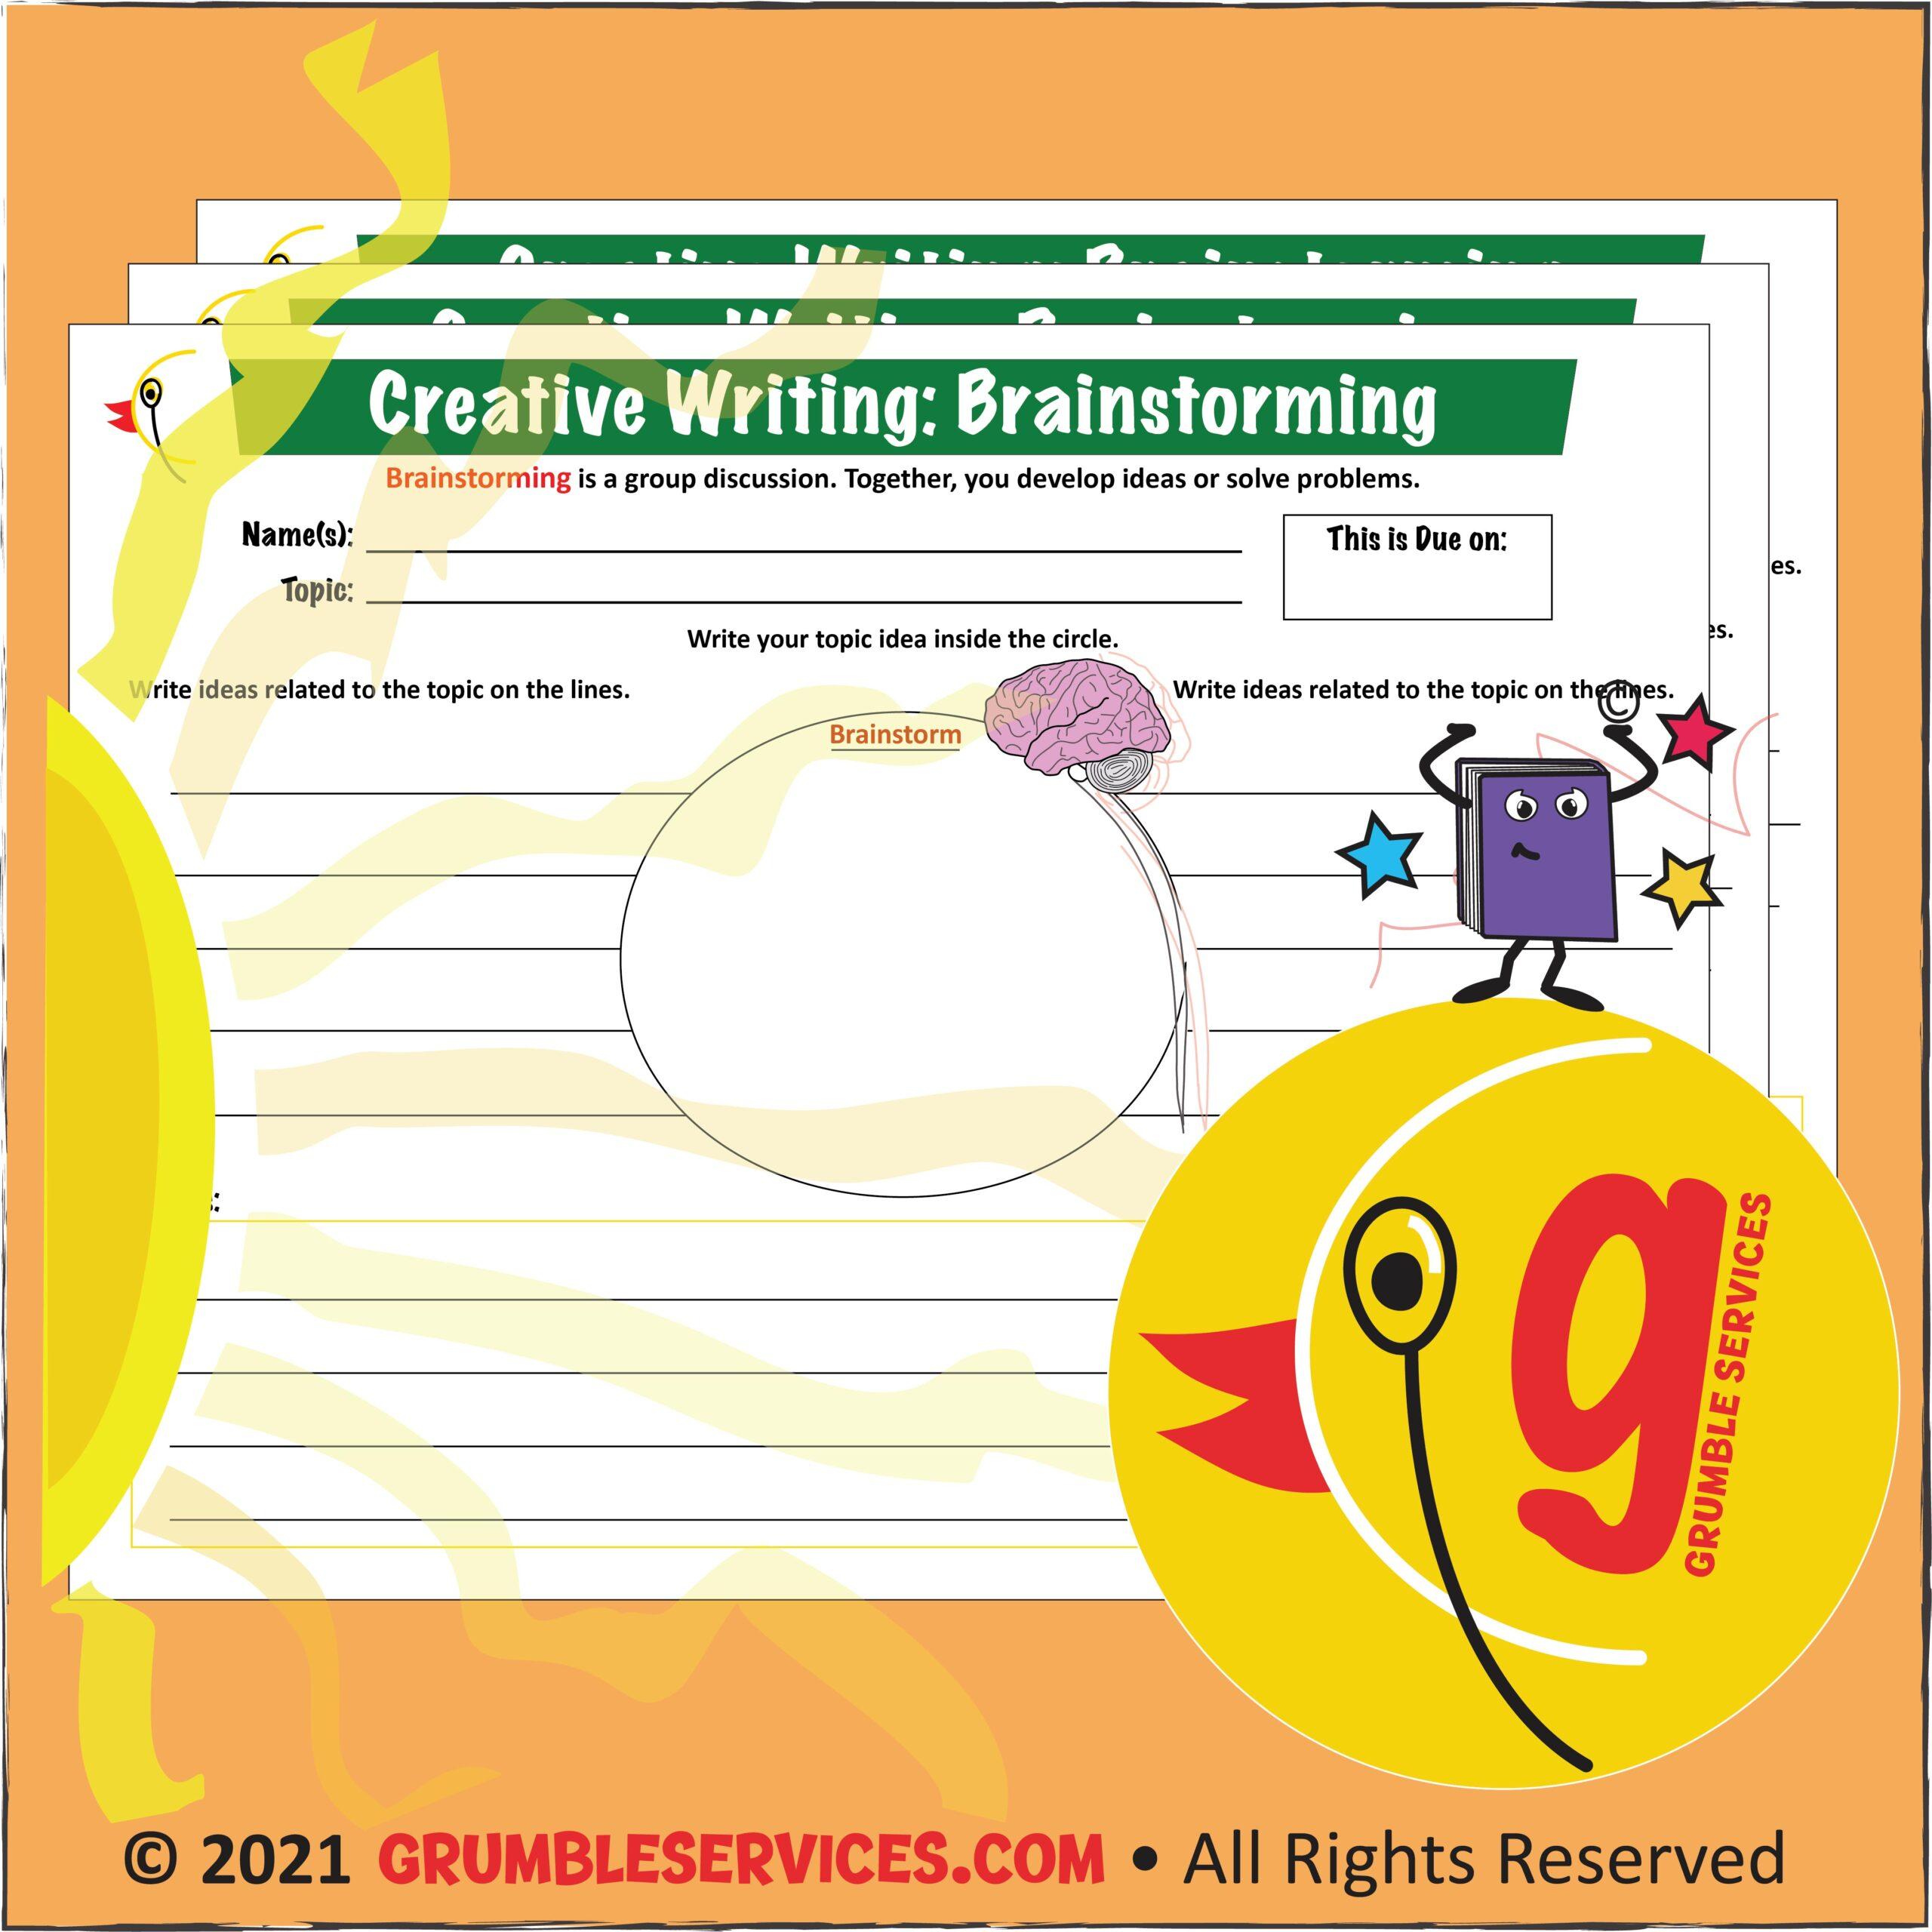 Montessori Blog - Brainstorming Graphic Organizer Elementary Montessori Creative Writing Worksheet Grumble Services Learning Resource